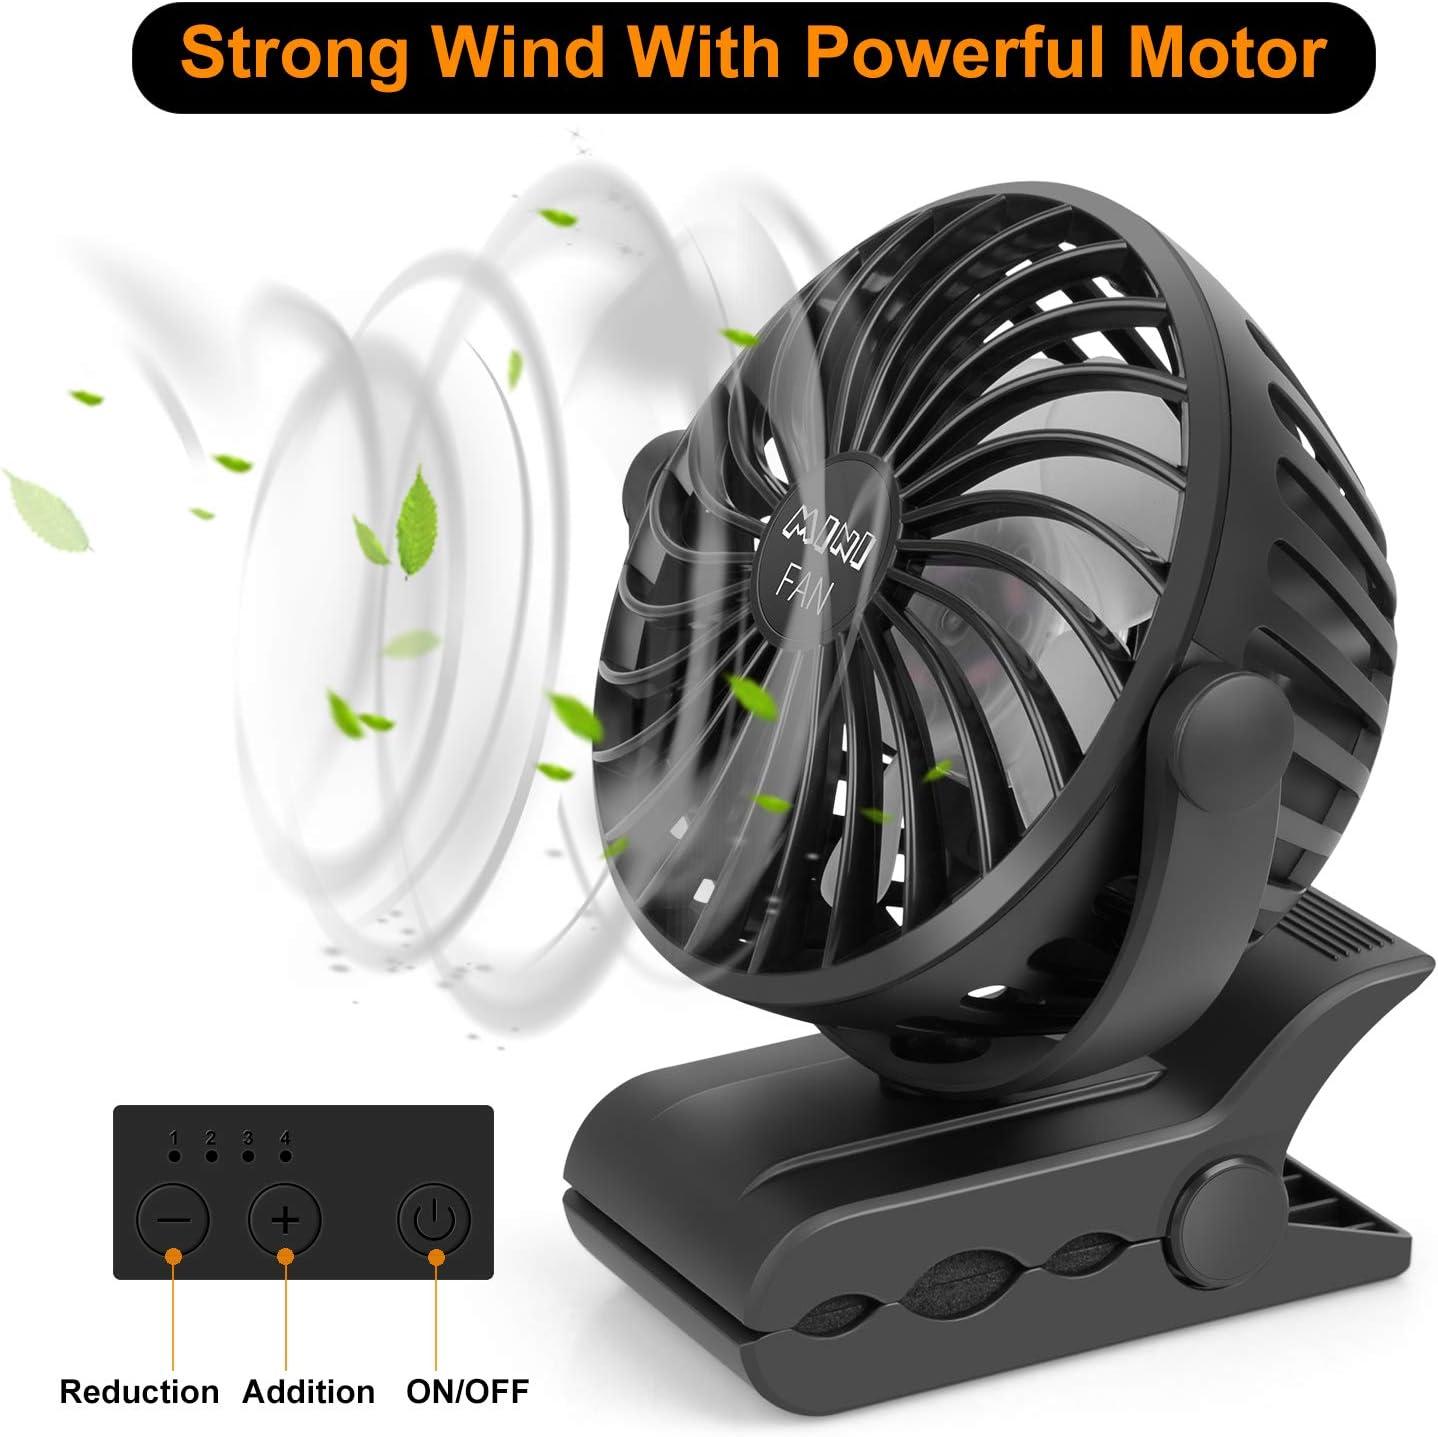 ESEOE Clip on Fan - USB Or 2600mAh Rechargeable Battery Operated Fan Small Desk Fan with 4 Speeds - 360 Degree Rotation Portable Stroller Fan for Baby